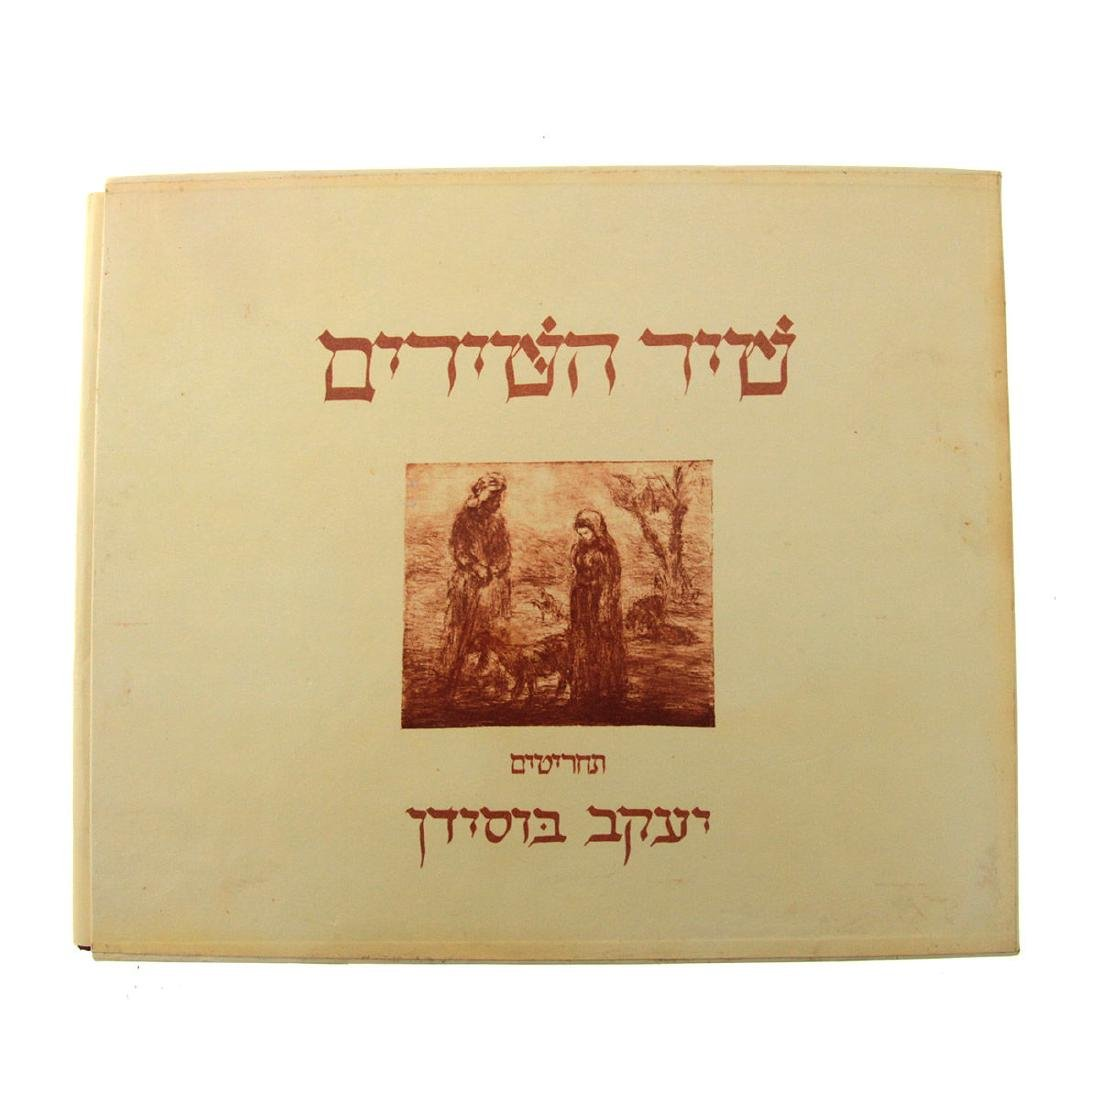 Song of Songs, Yaakov Boussisan, Artist's Dedication.